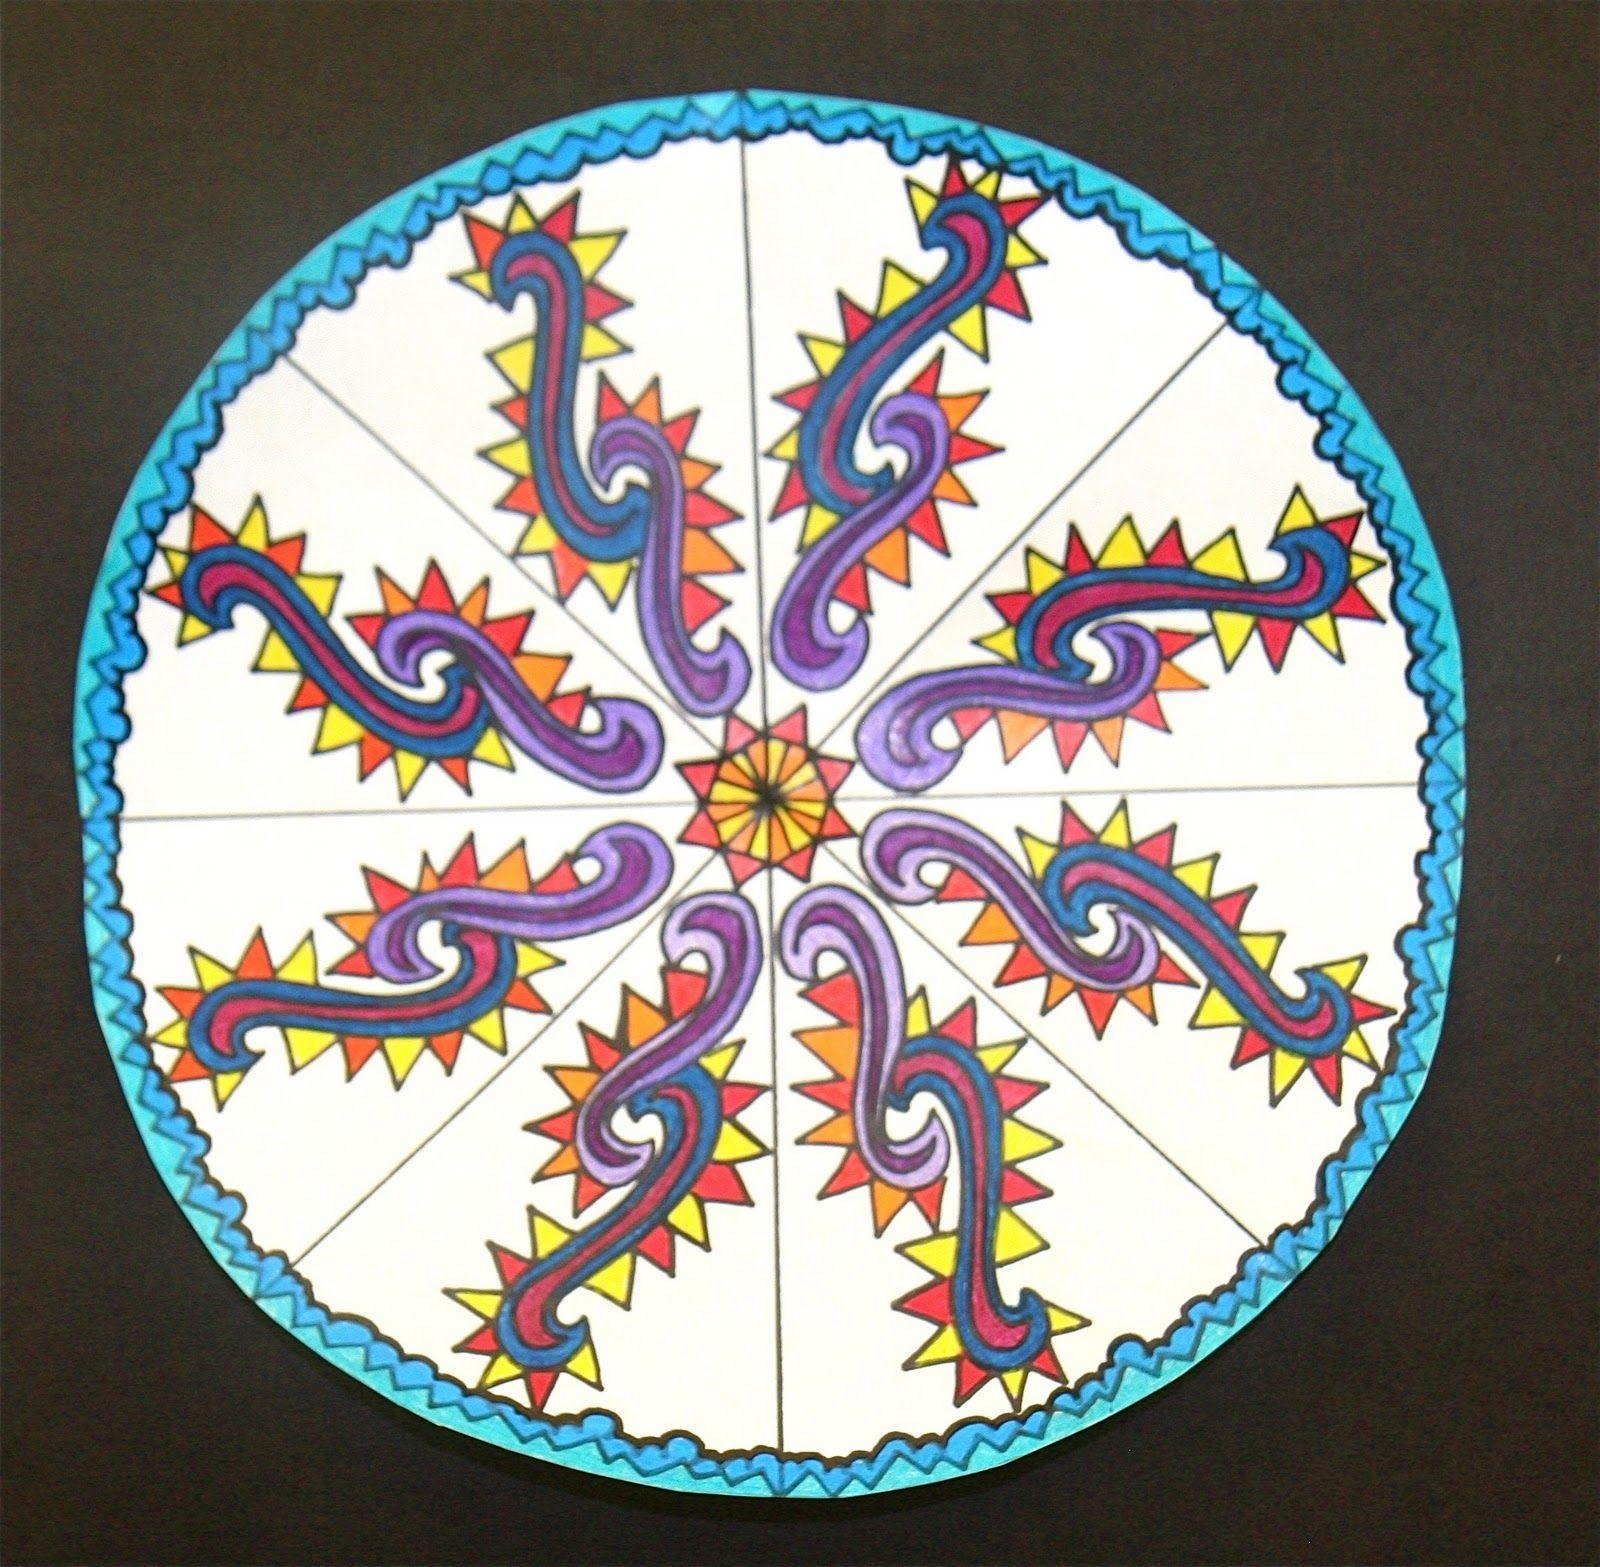 Splish Splash Splatter Rotational Symmetry Similar To My Lesson Plan But I Like Using The Diy